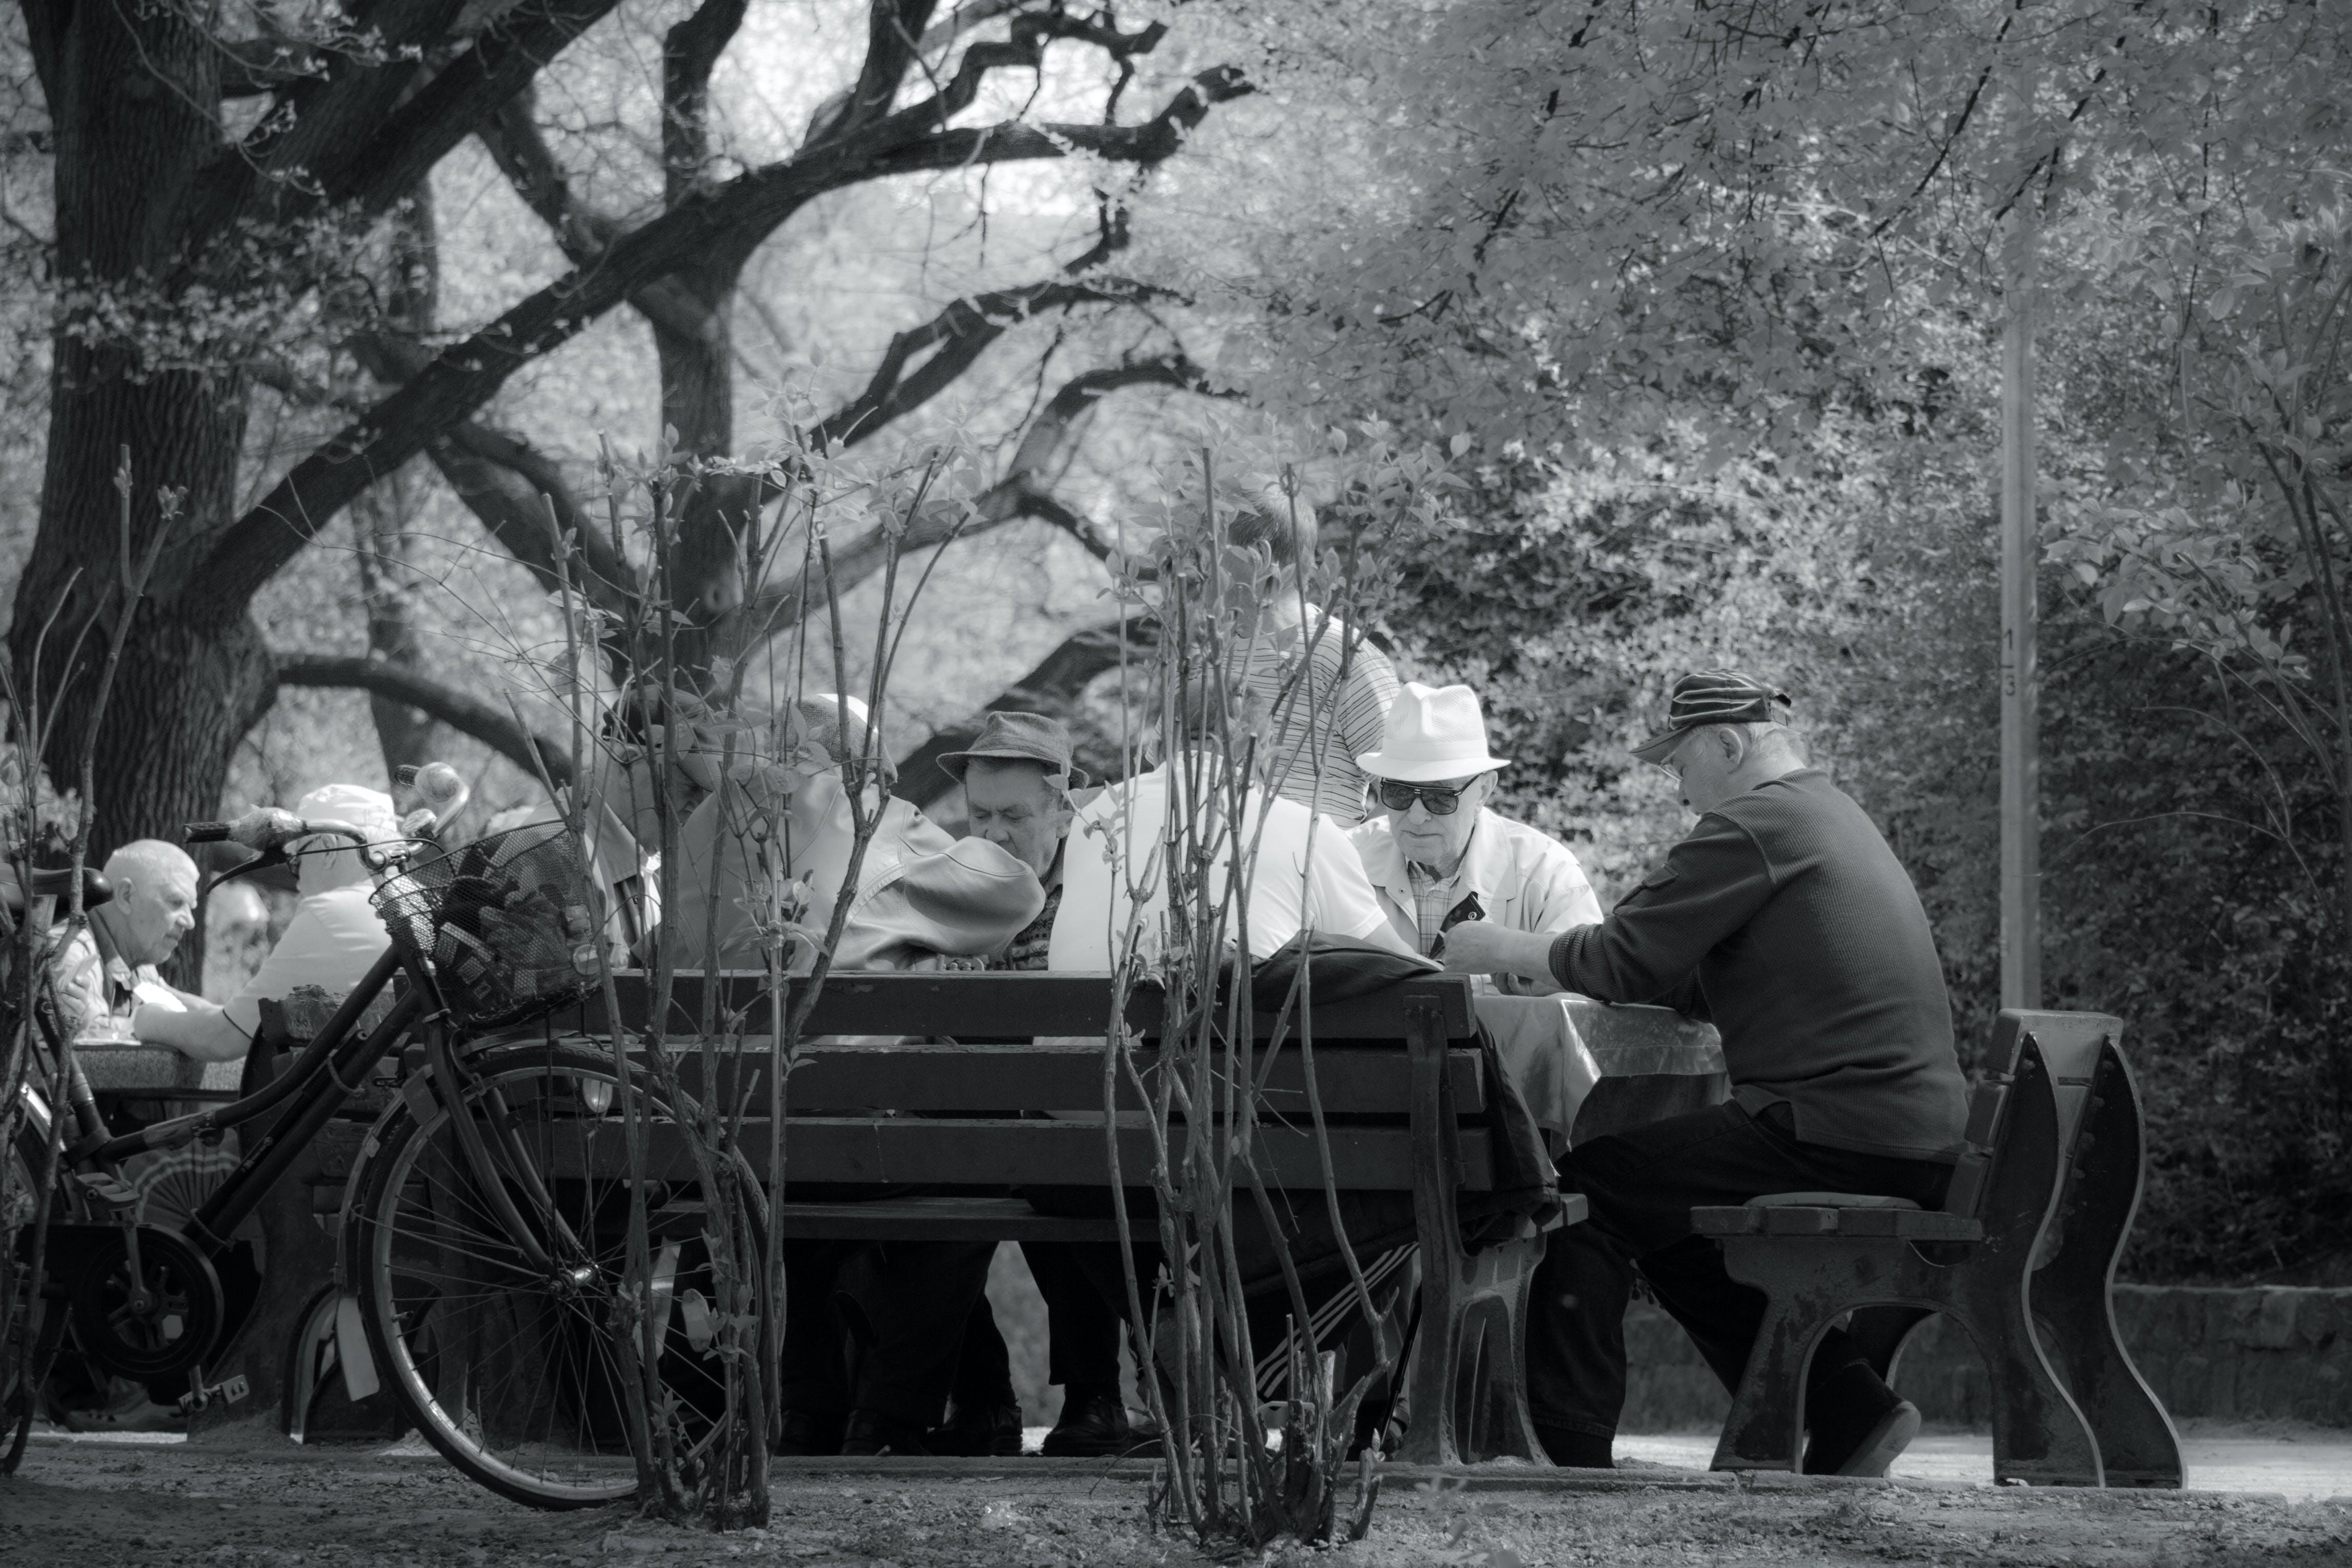 Men Sitting on Wooden Chairs Under Tree